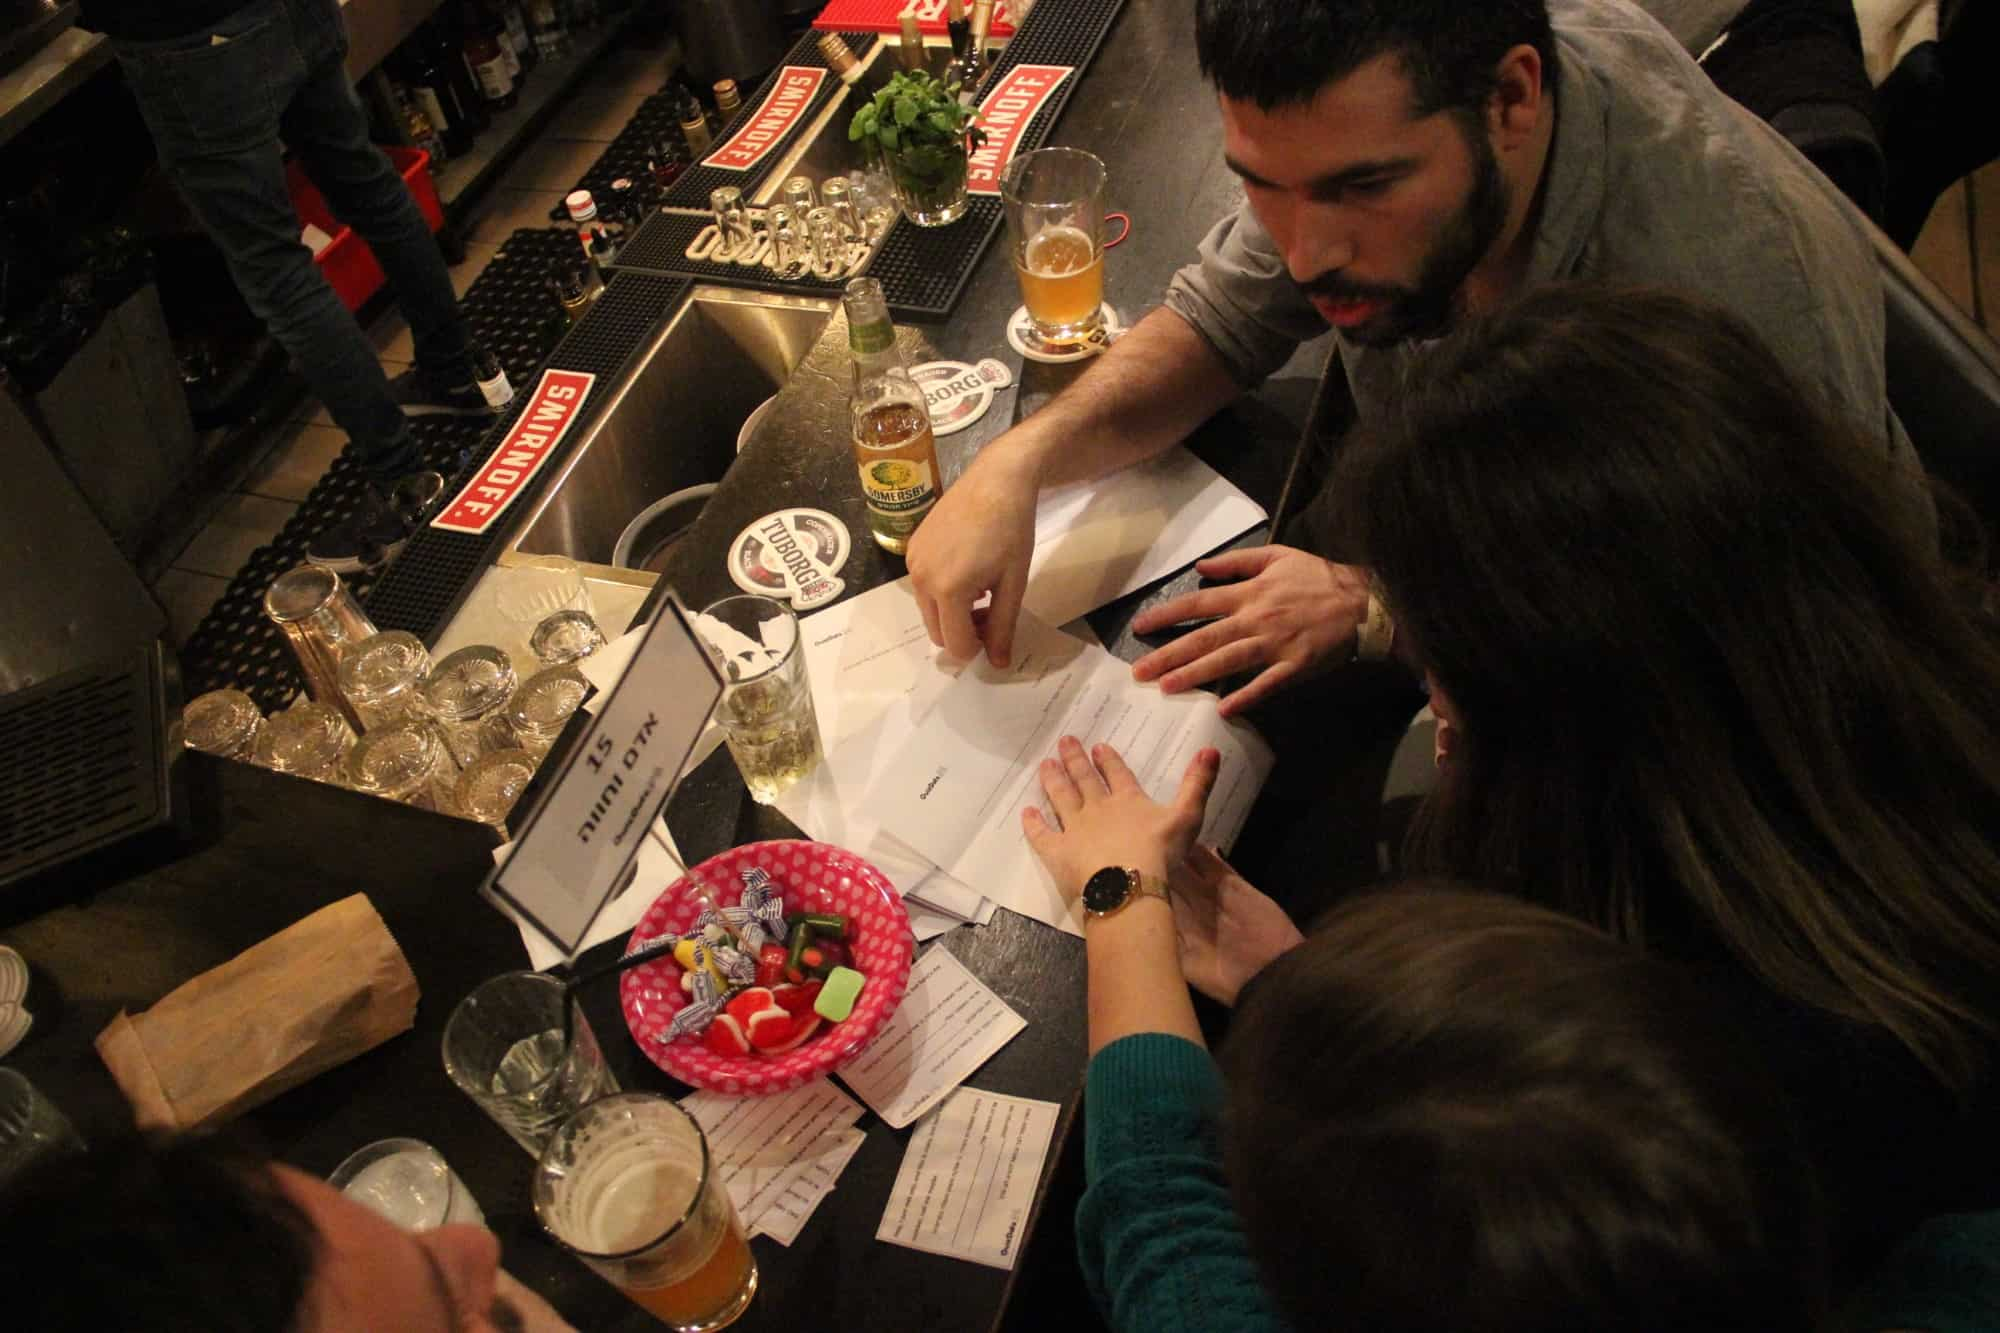 We Quiz משתלטים על מוזיאון נחום גוטמן